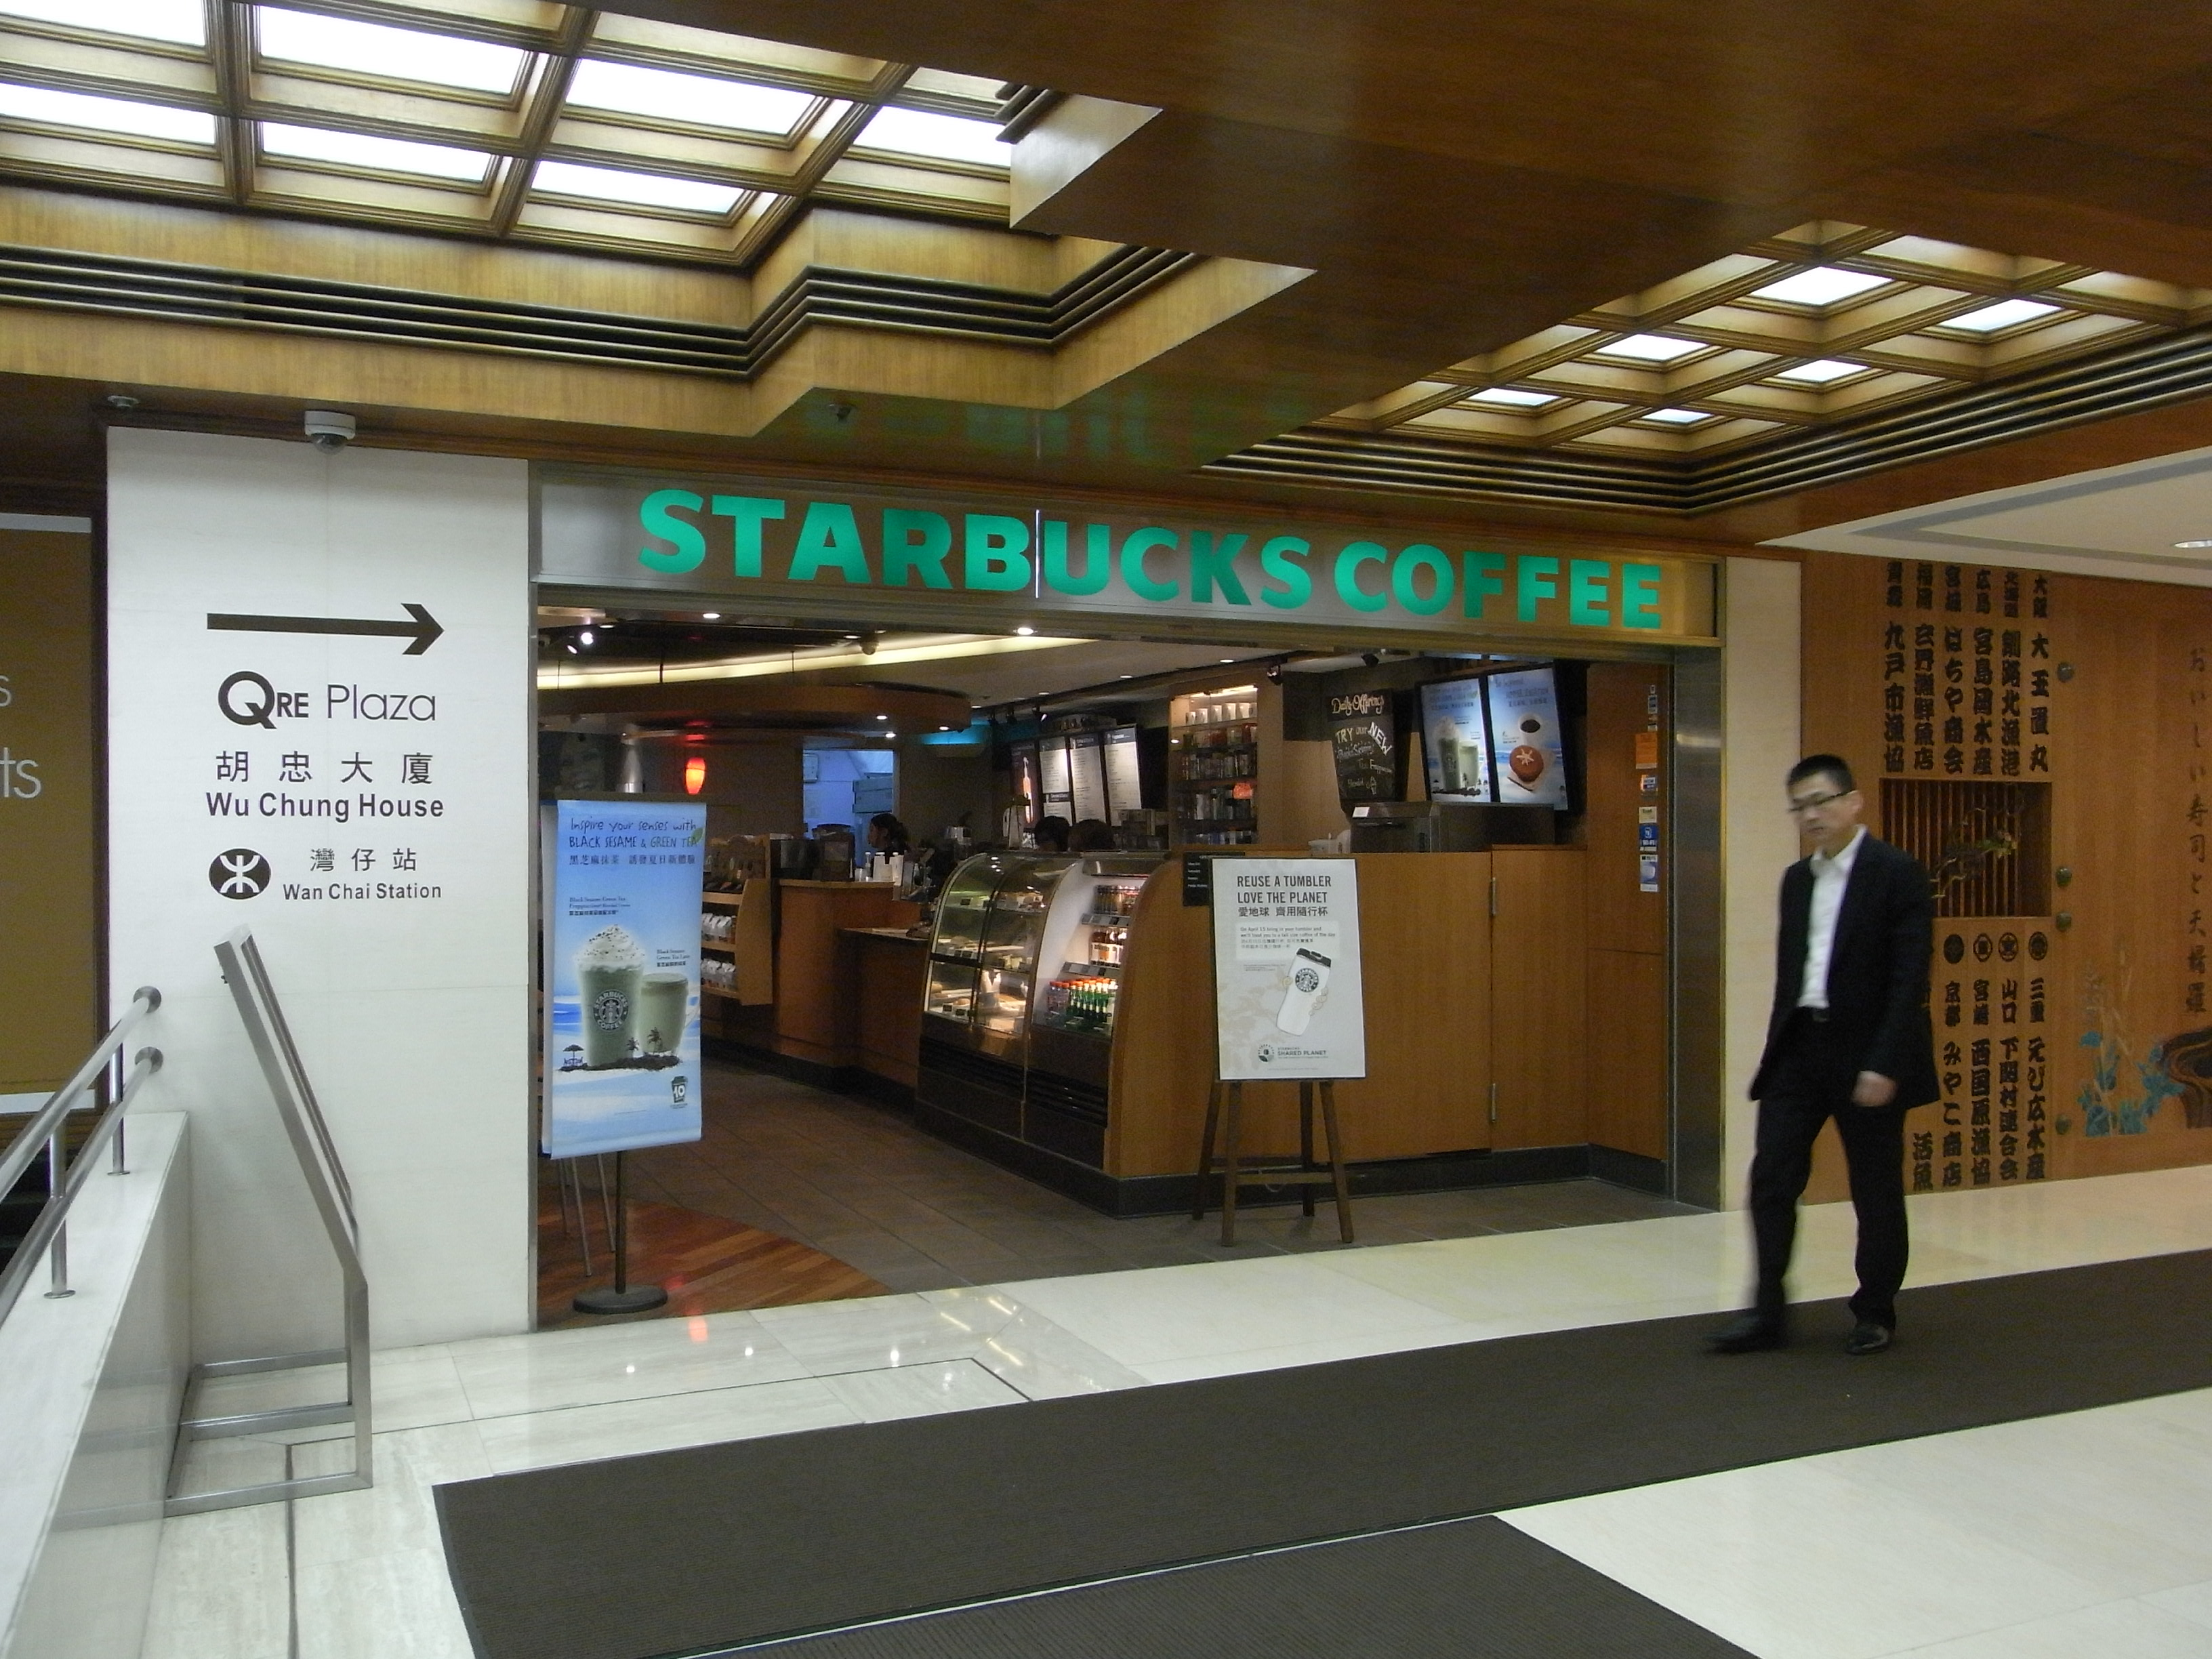 Starbucks Near Hotel Steglitz